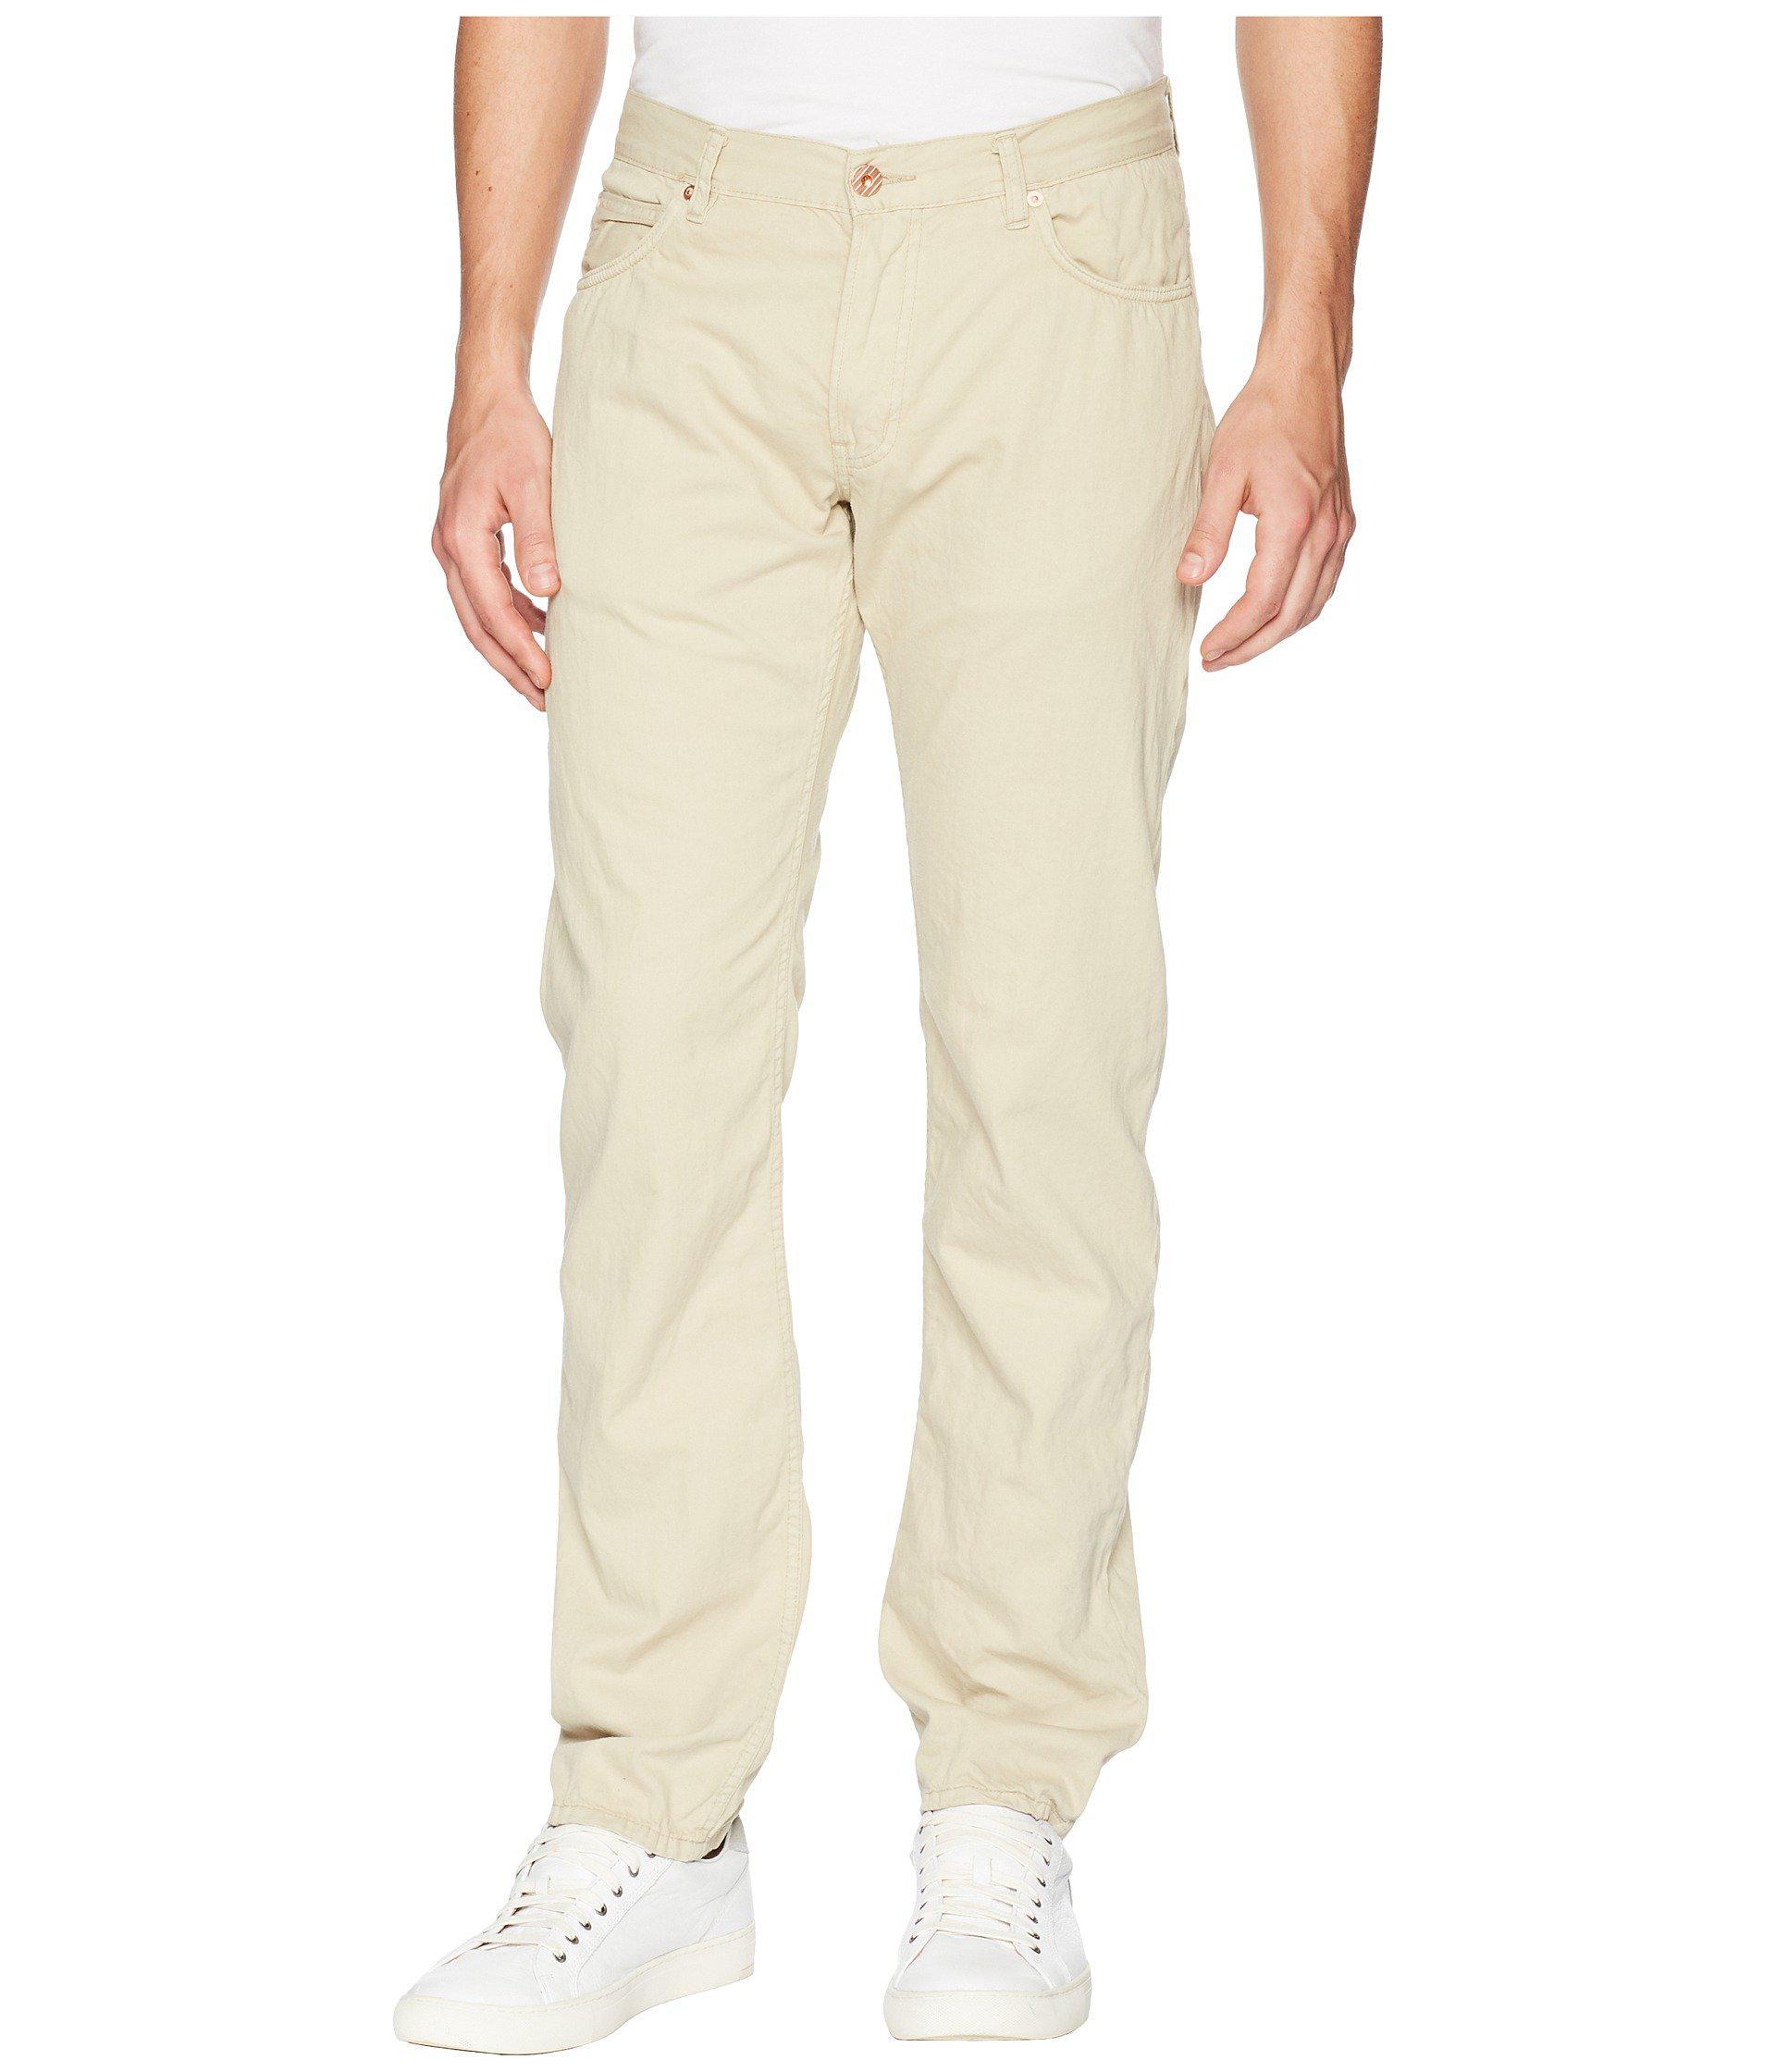 48310202 Lyst - Billy Reid Slim Jeans In Khaki in Natural for Men